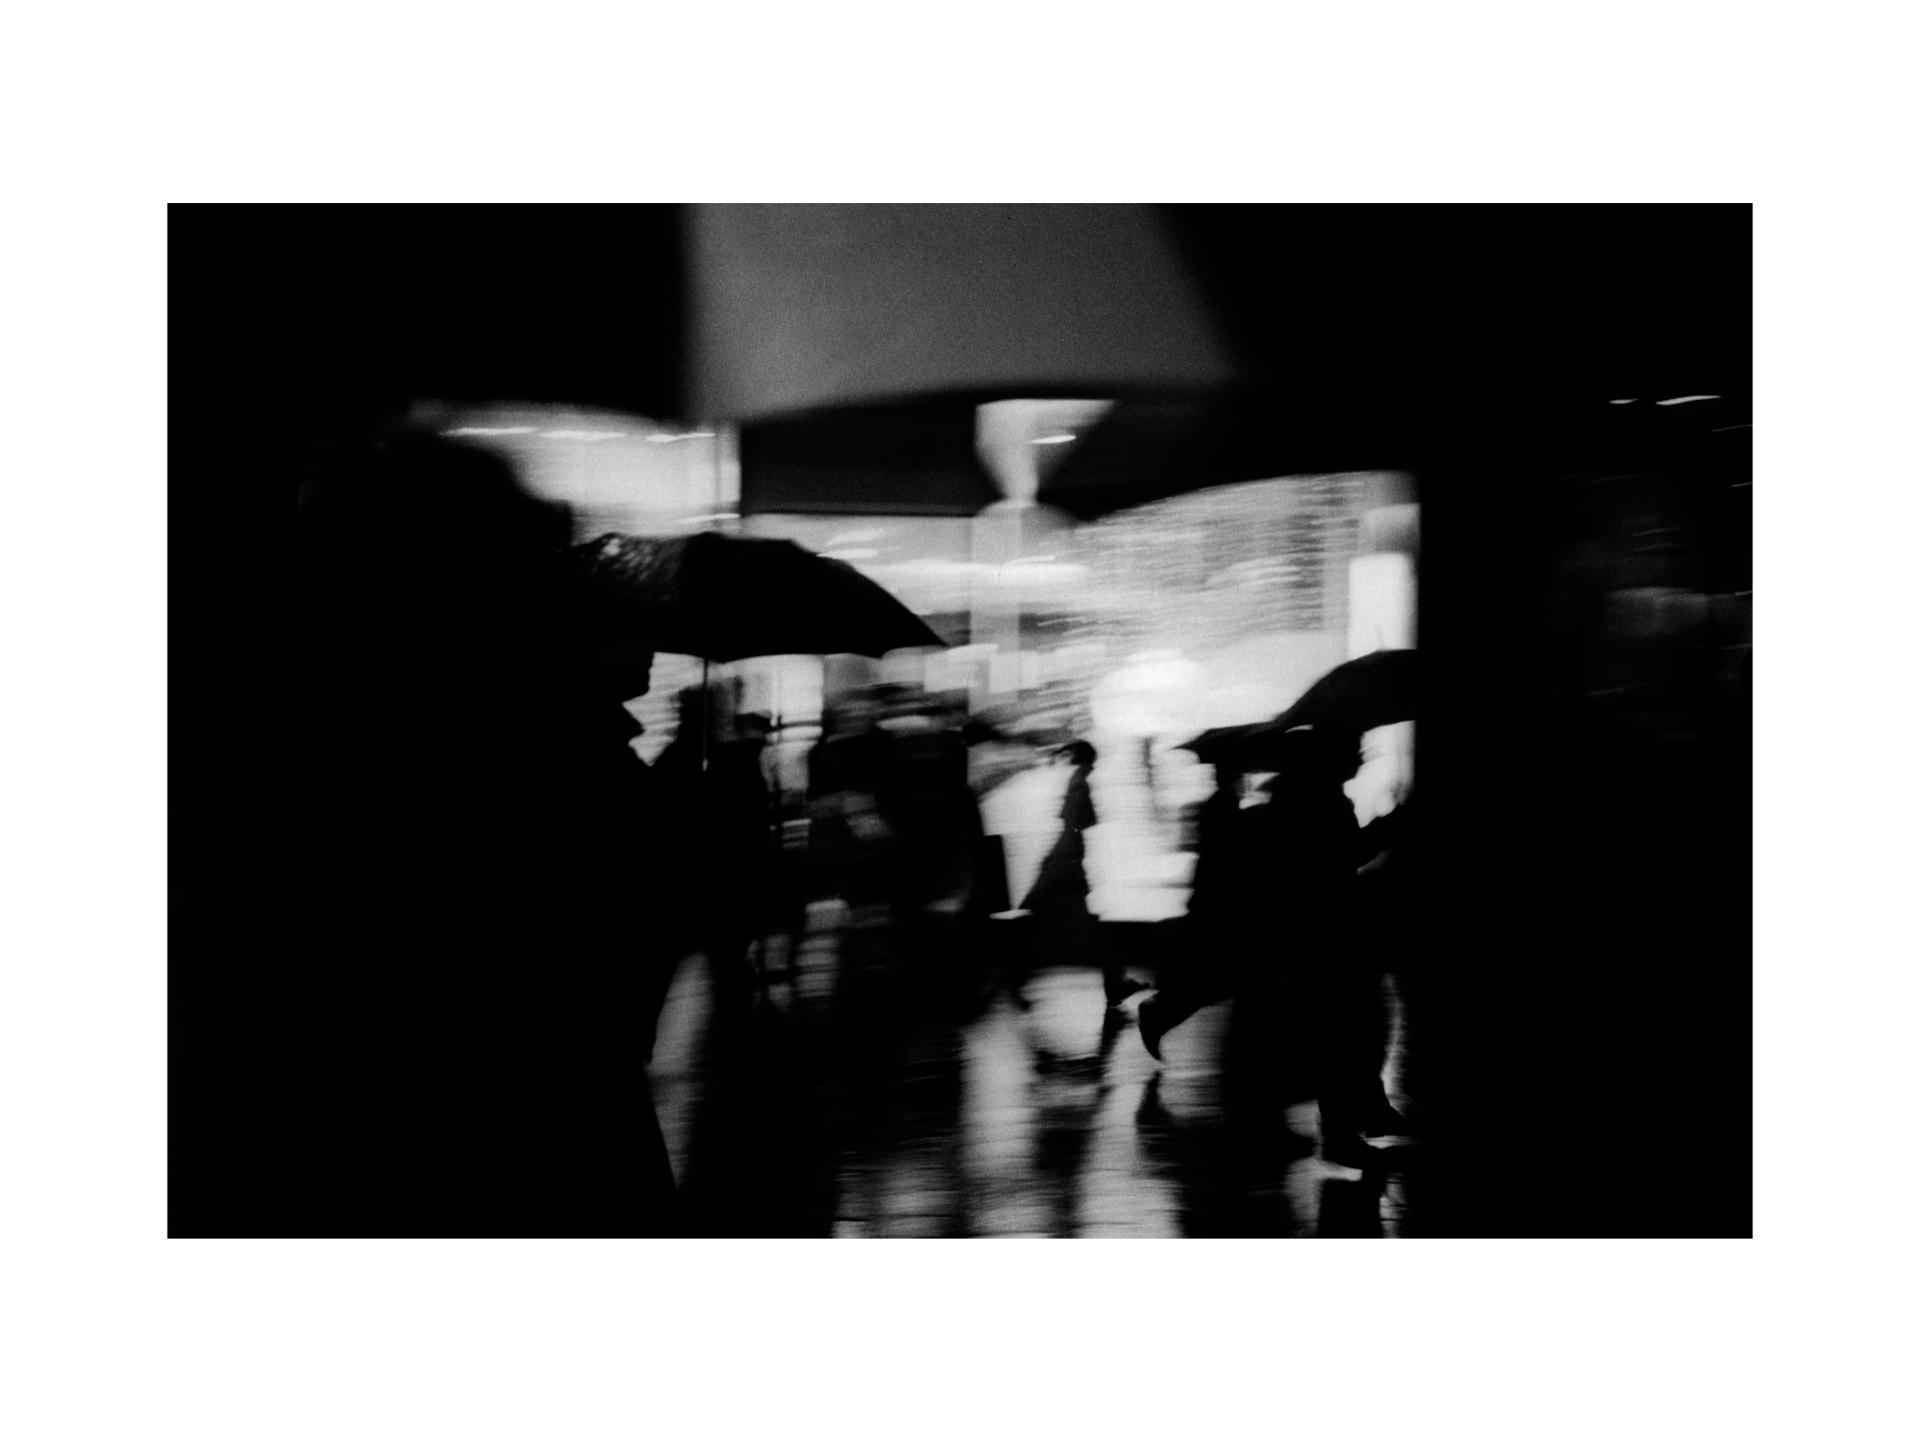 Image of Buchanan Rain, Glasgow 2008 by David Peat